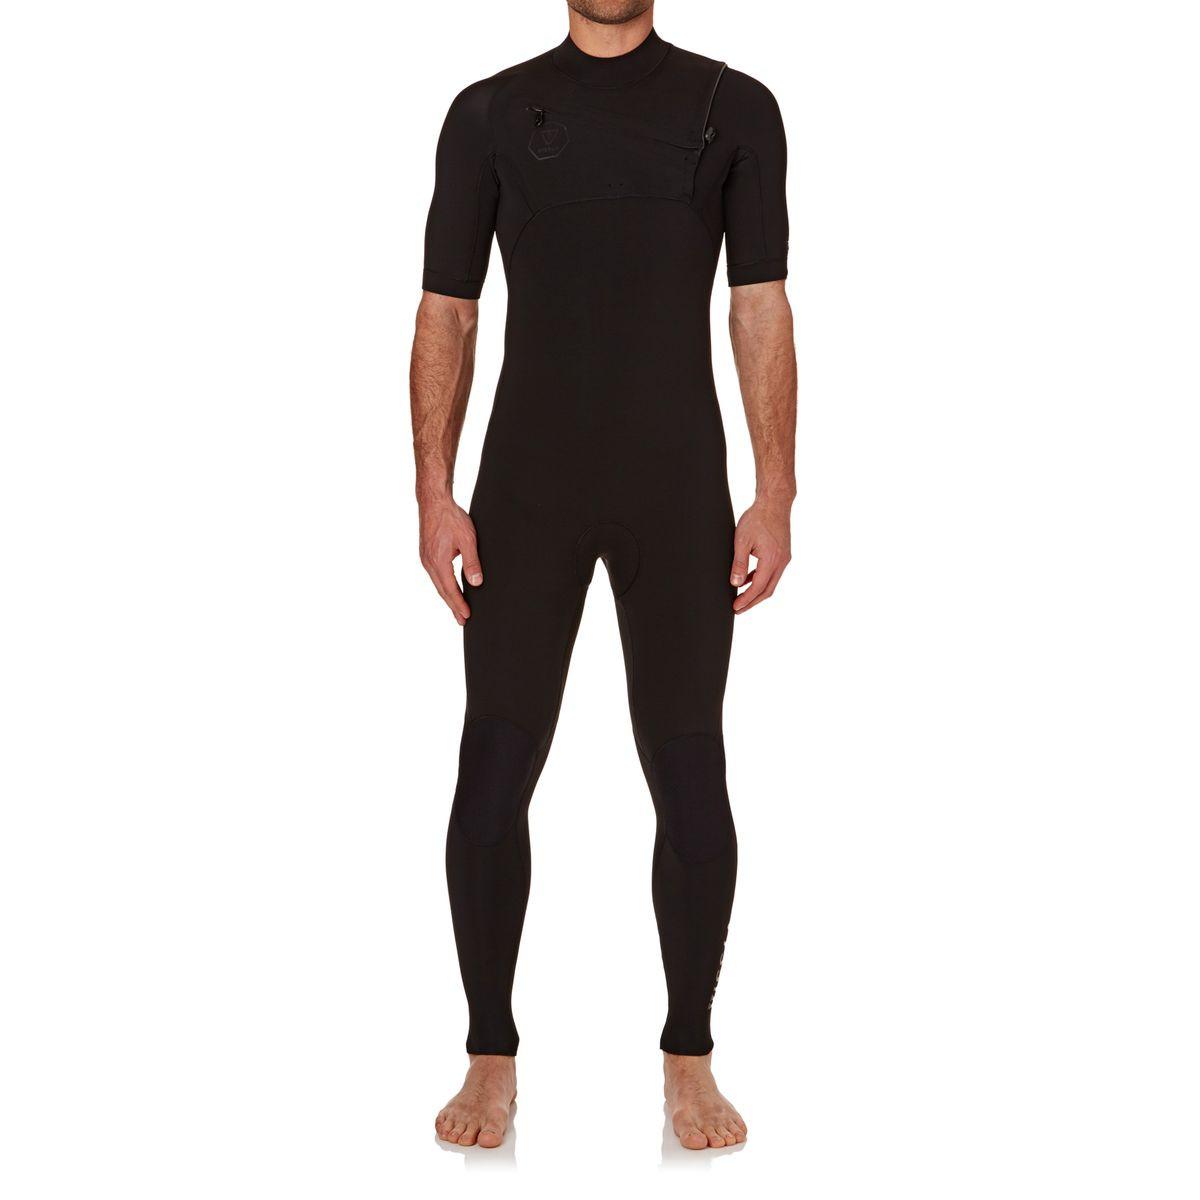 Vissla 7 Seas 2mm 2017 Short Sleeve Wetsuit - Stealth